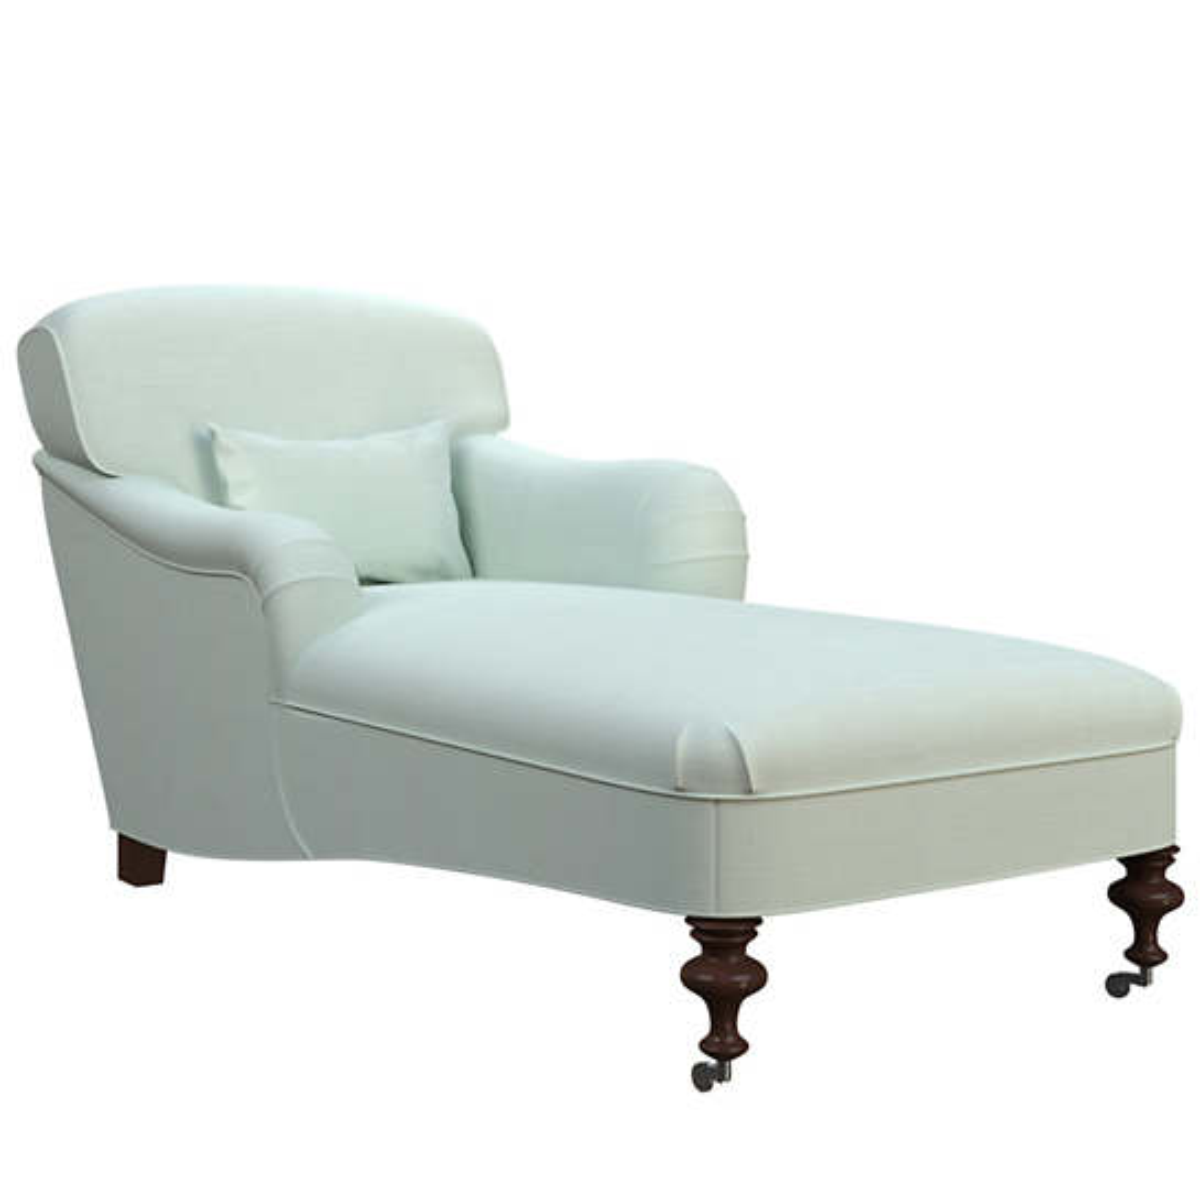 Estate Linen Powder Blue Beaufort Chaise